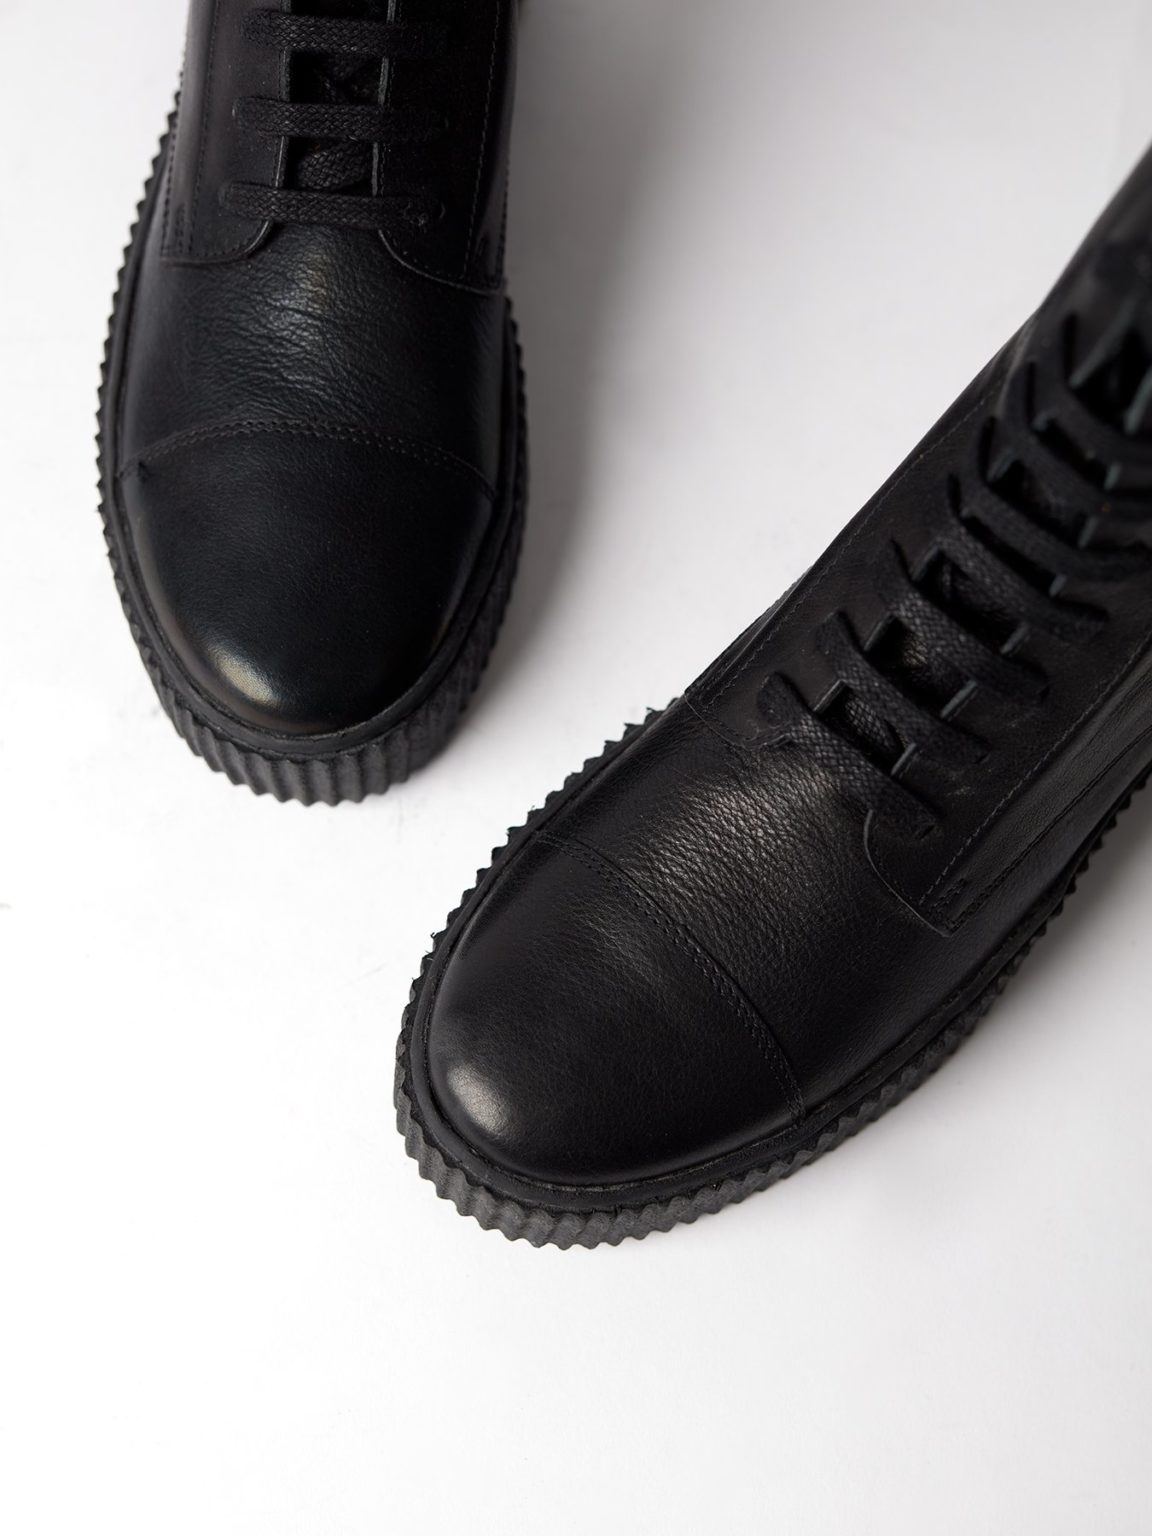 Blankens - The Camden, Black Leather